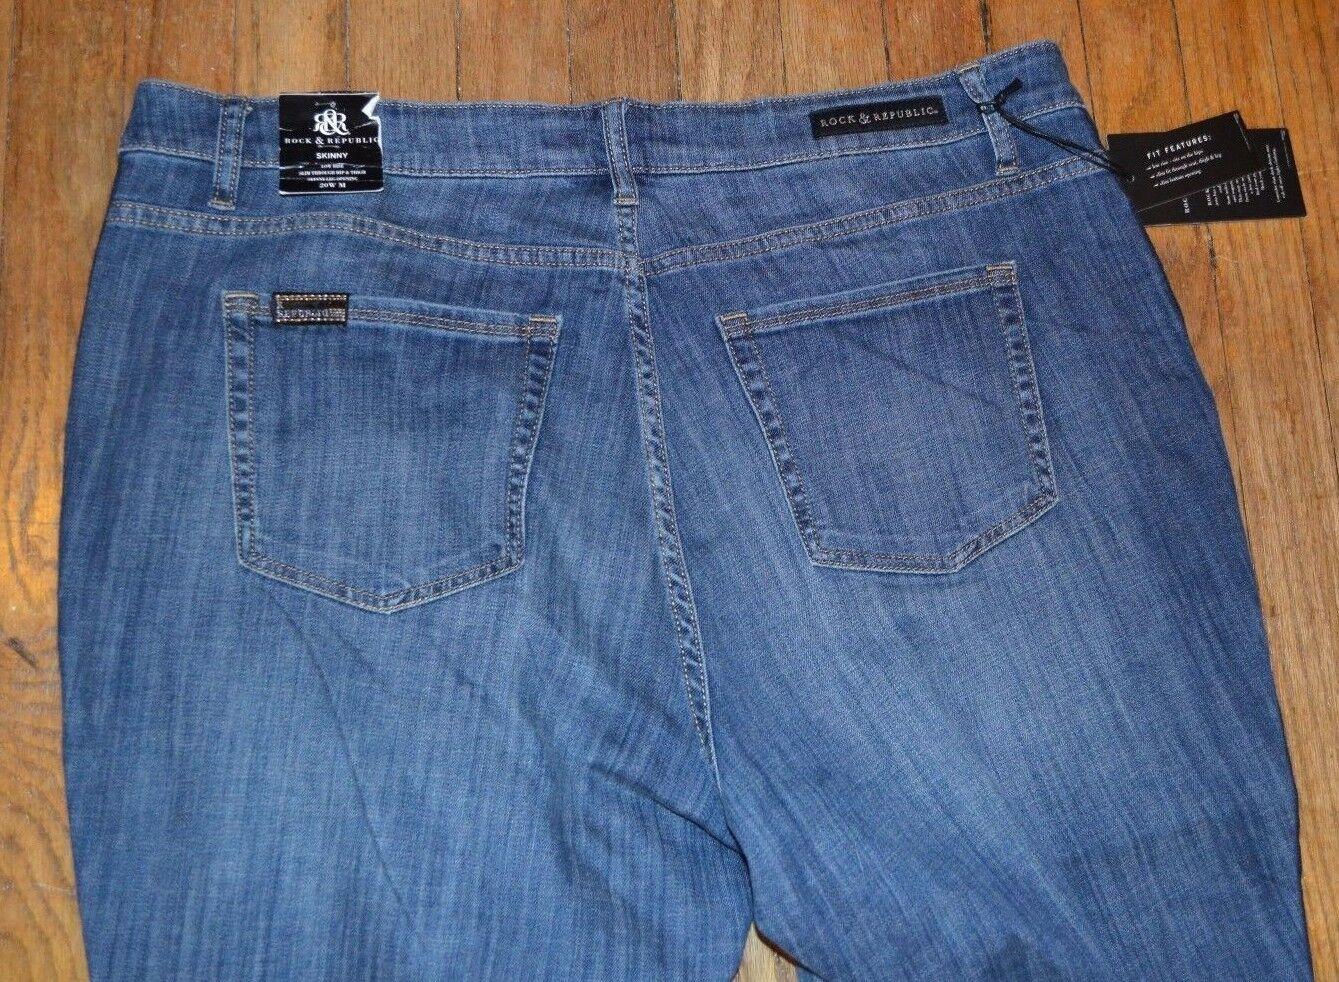 Rock /& Republic Skinny Berlin Caviar Low Rise Slim Fit Skinny Jeans MSRP $92.00